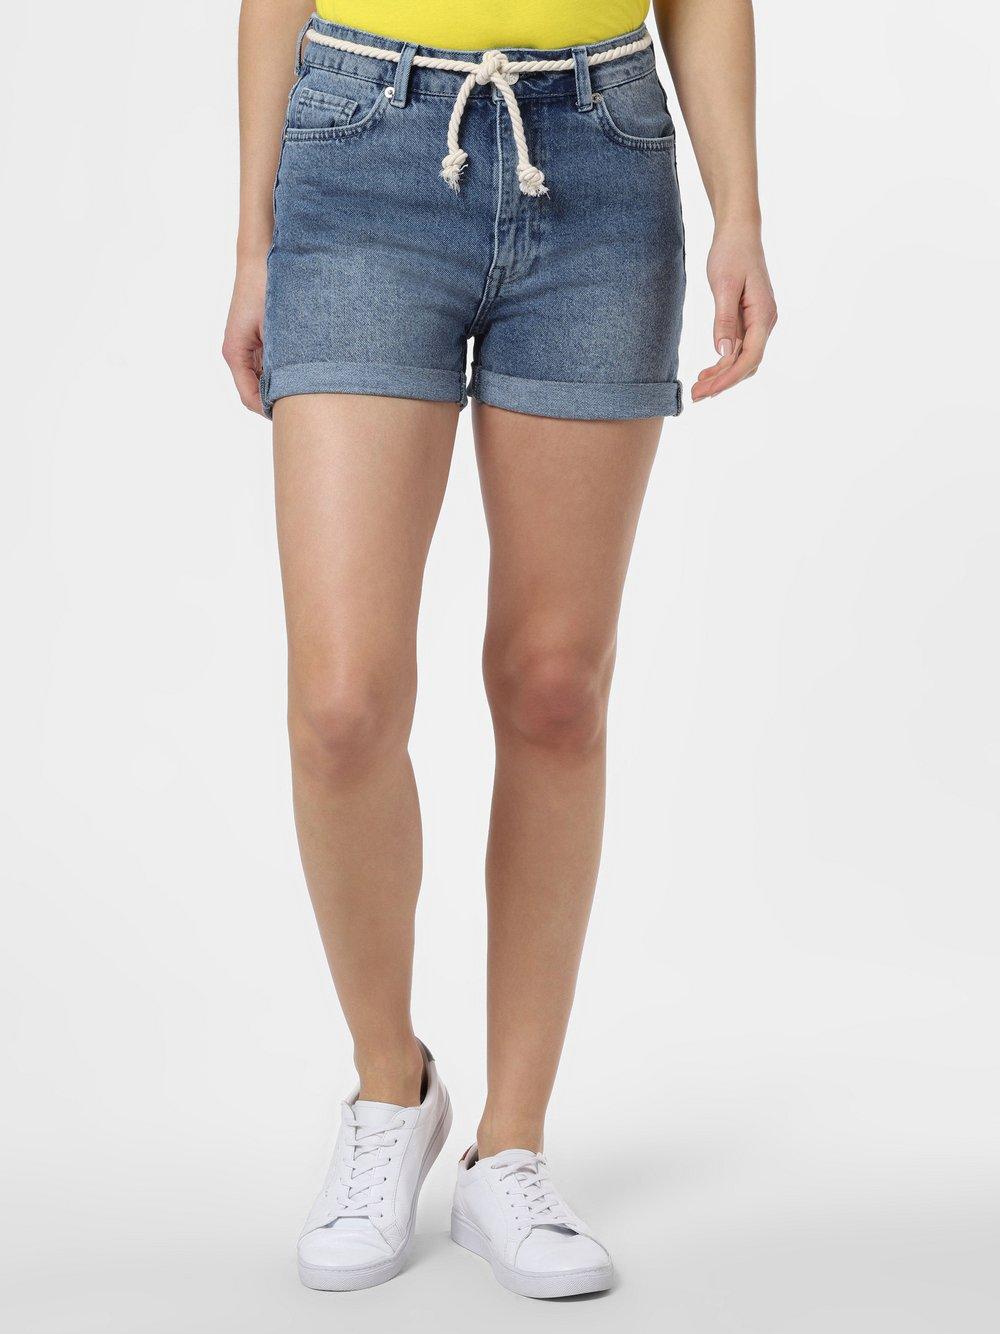 Minimum – Damskie spodenki jeansowe – Abarna, niebieski Van Graaf 464878-0001